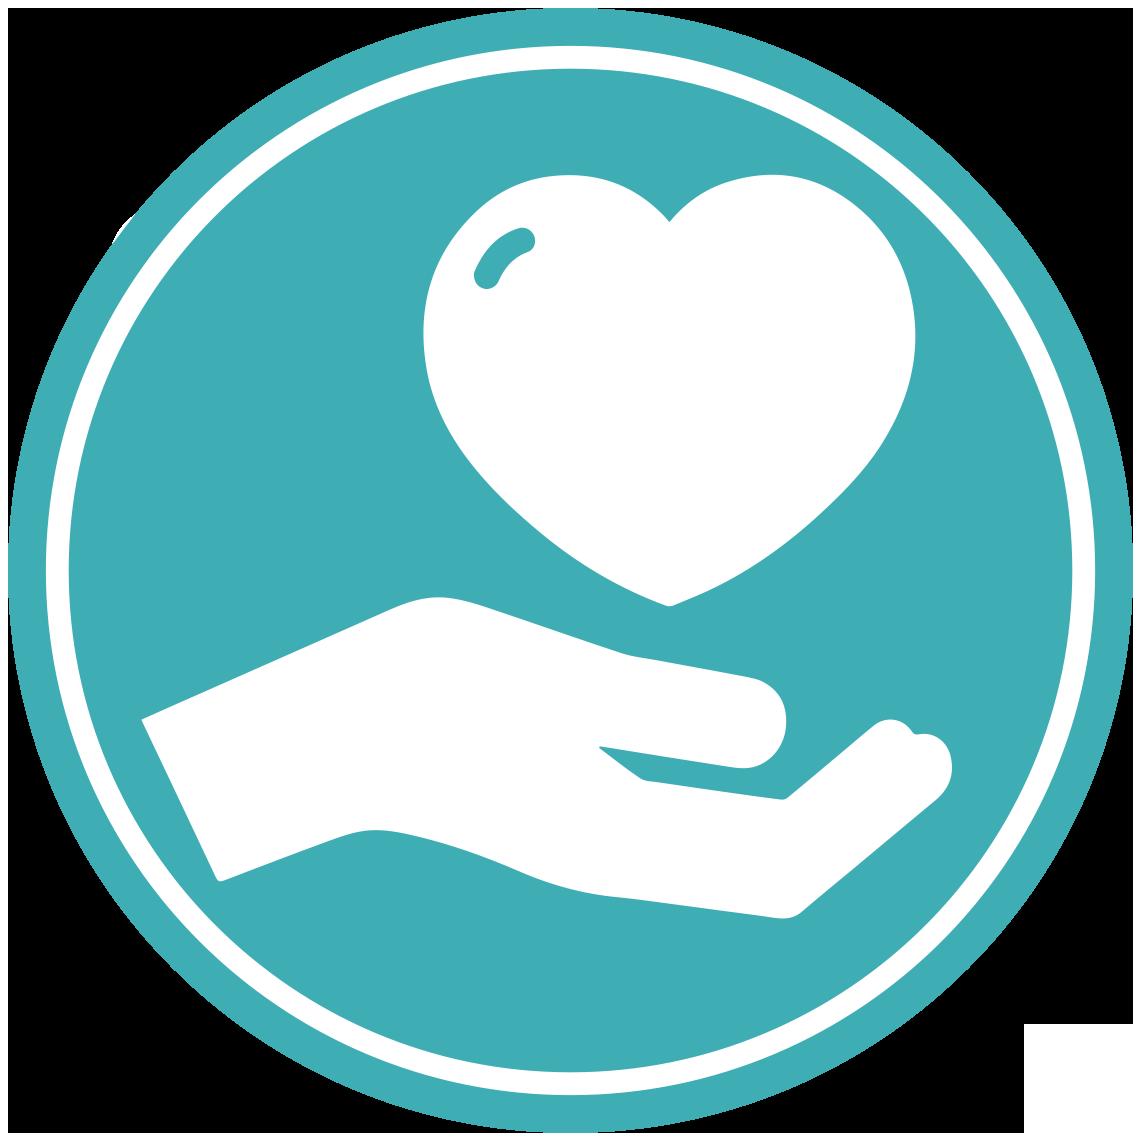 ICON - We Care